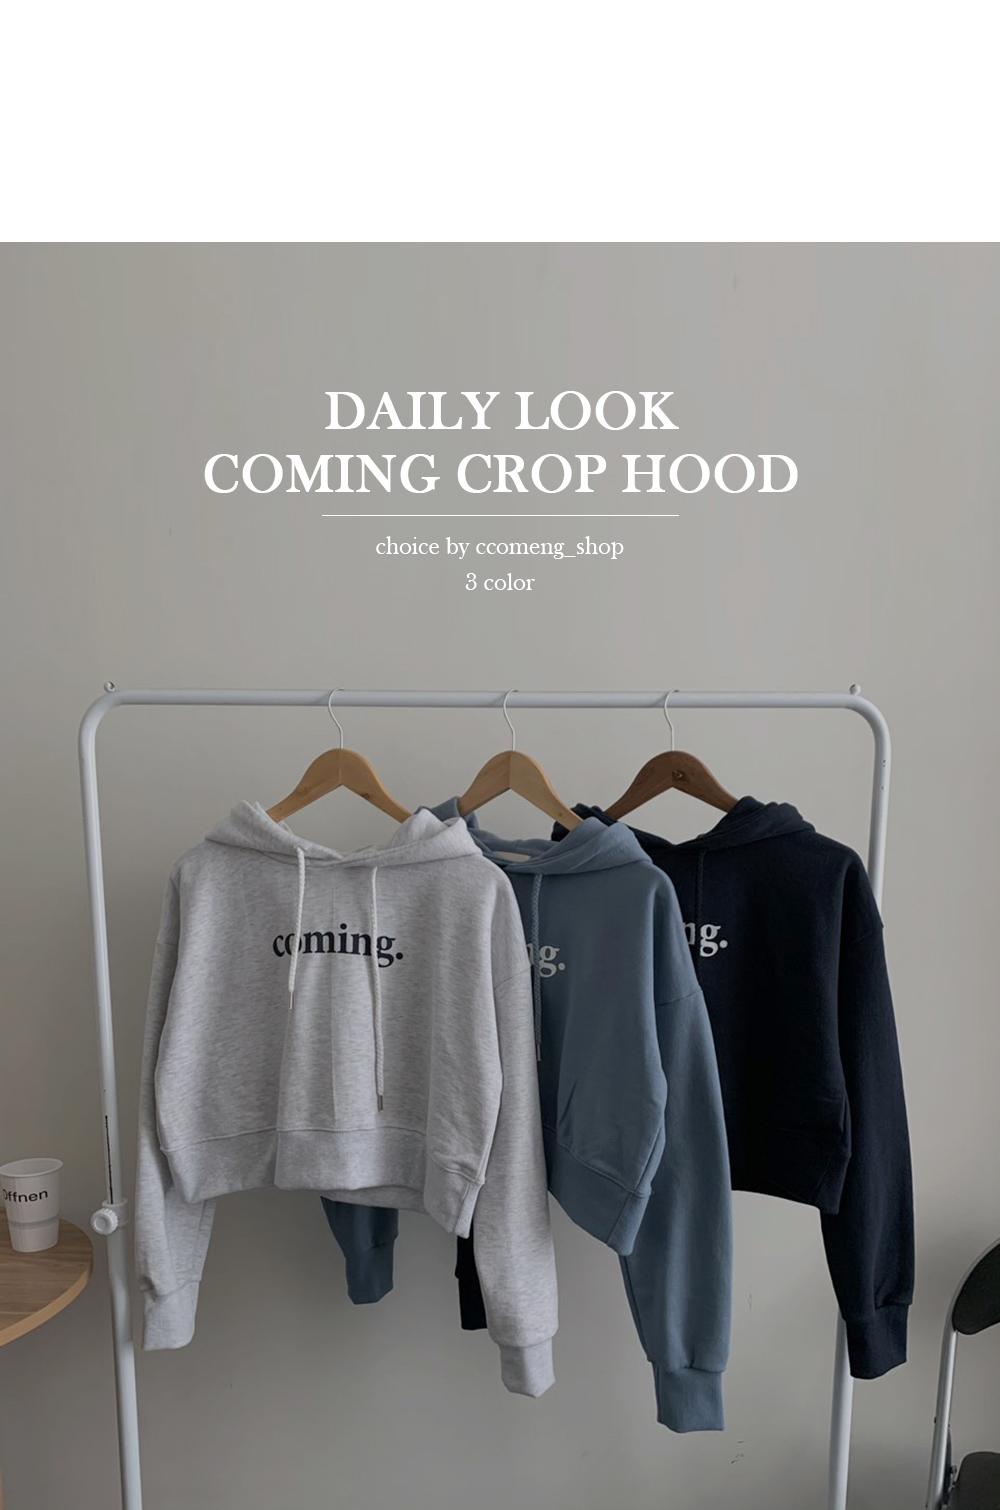 Coming Crop Hooded Tea